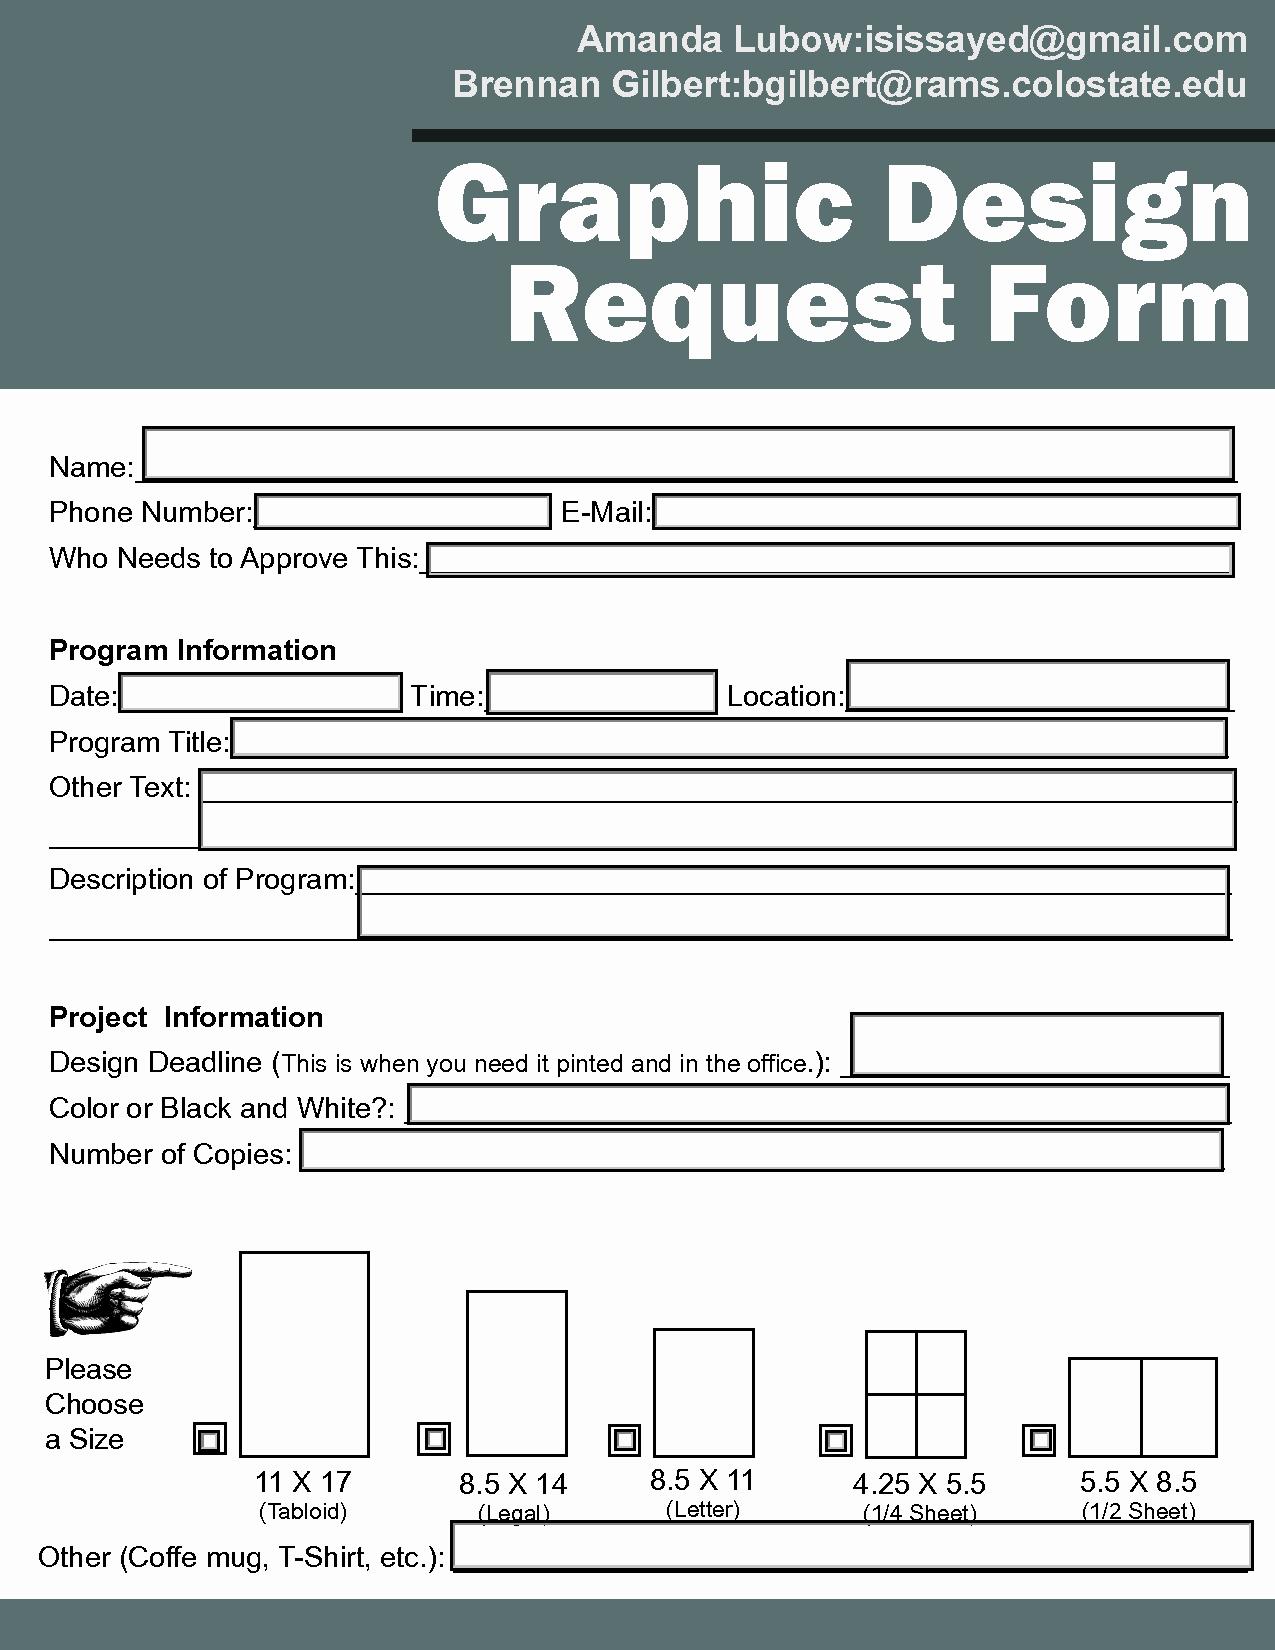 Graphic Design Contract Template Elegant Graphic Design Contract Template